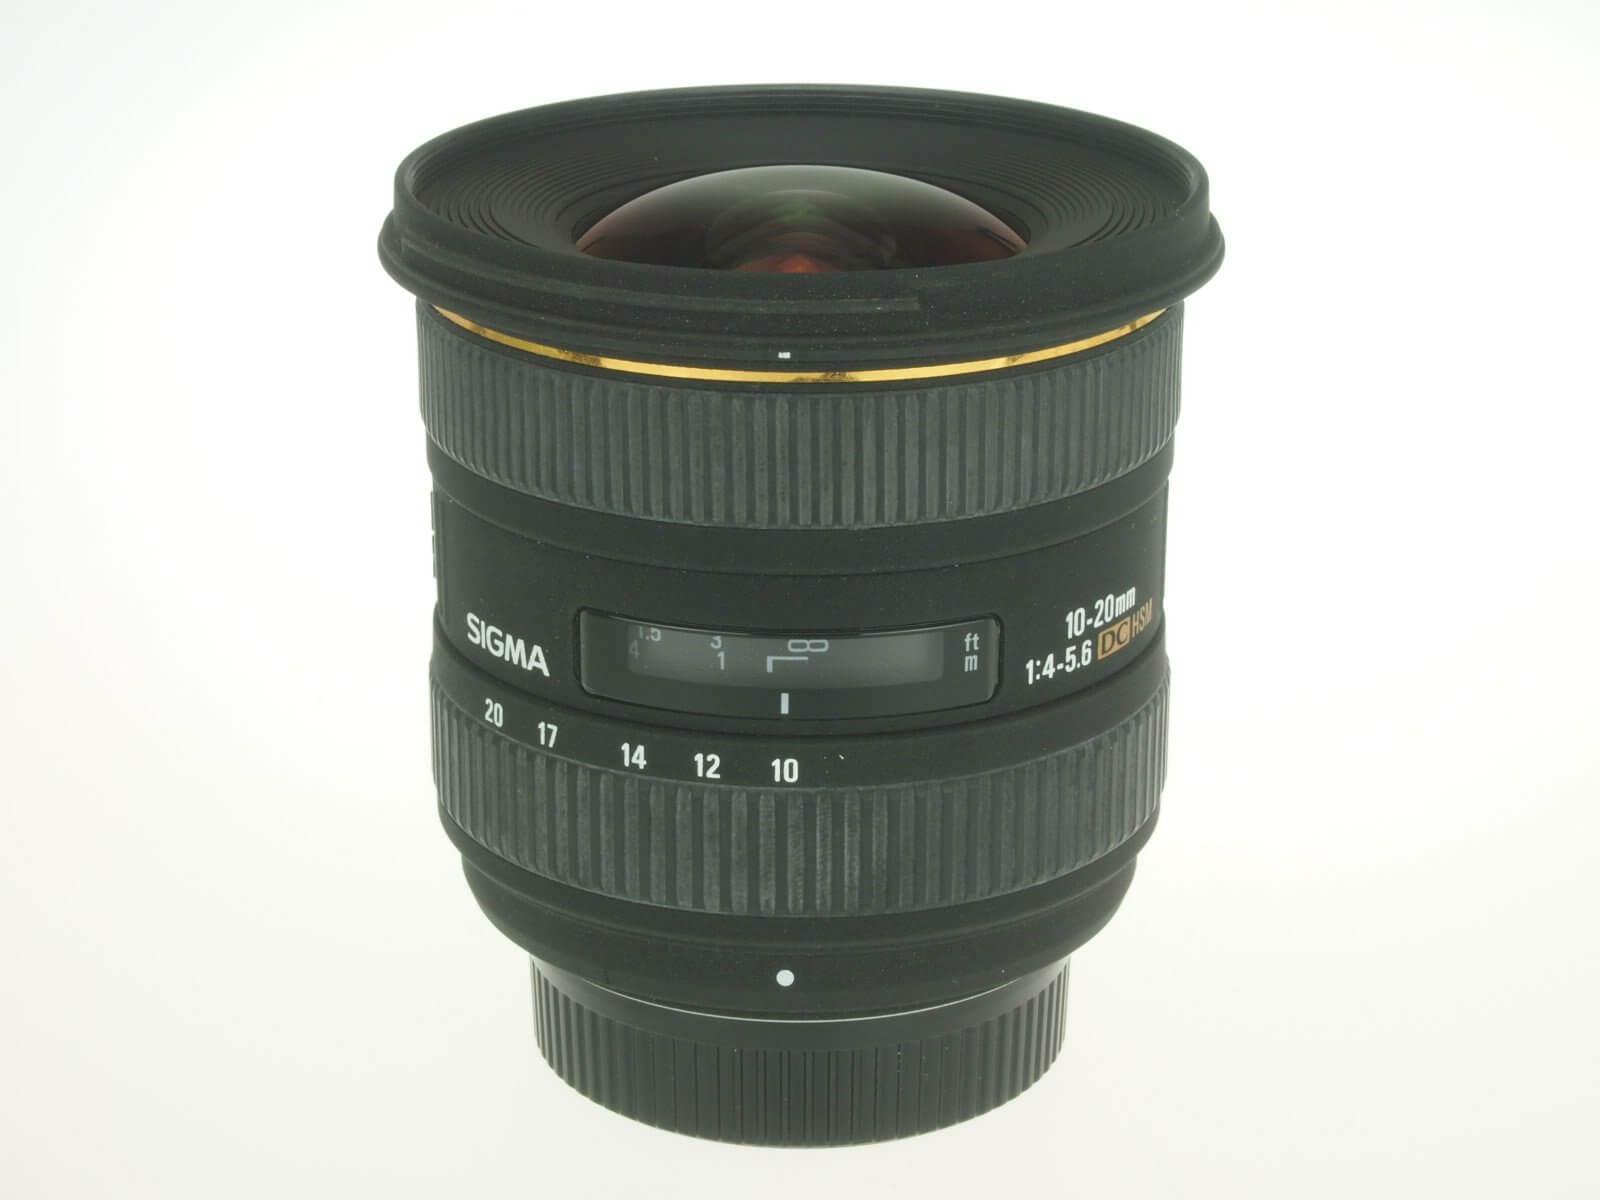 Sigma 10-20mm f4-5.6 DC HSM lens, Nikon mount, almost mint!